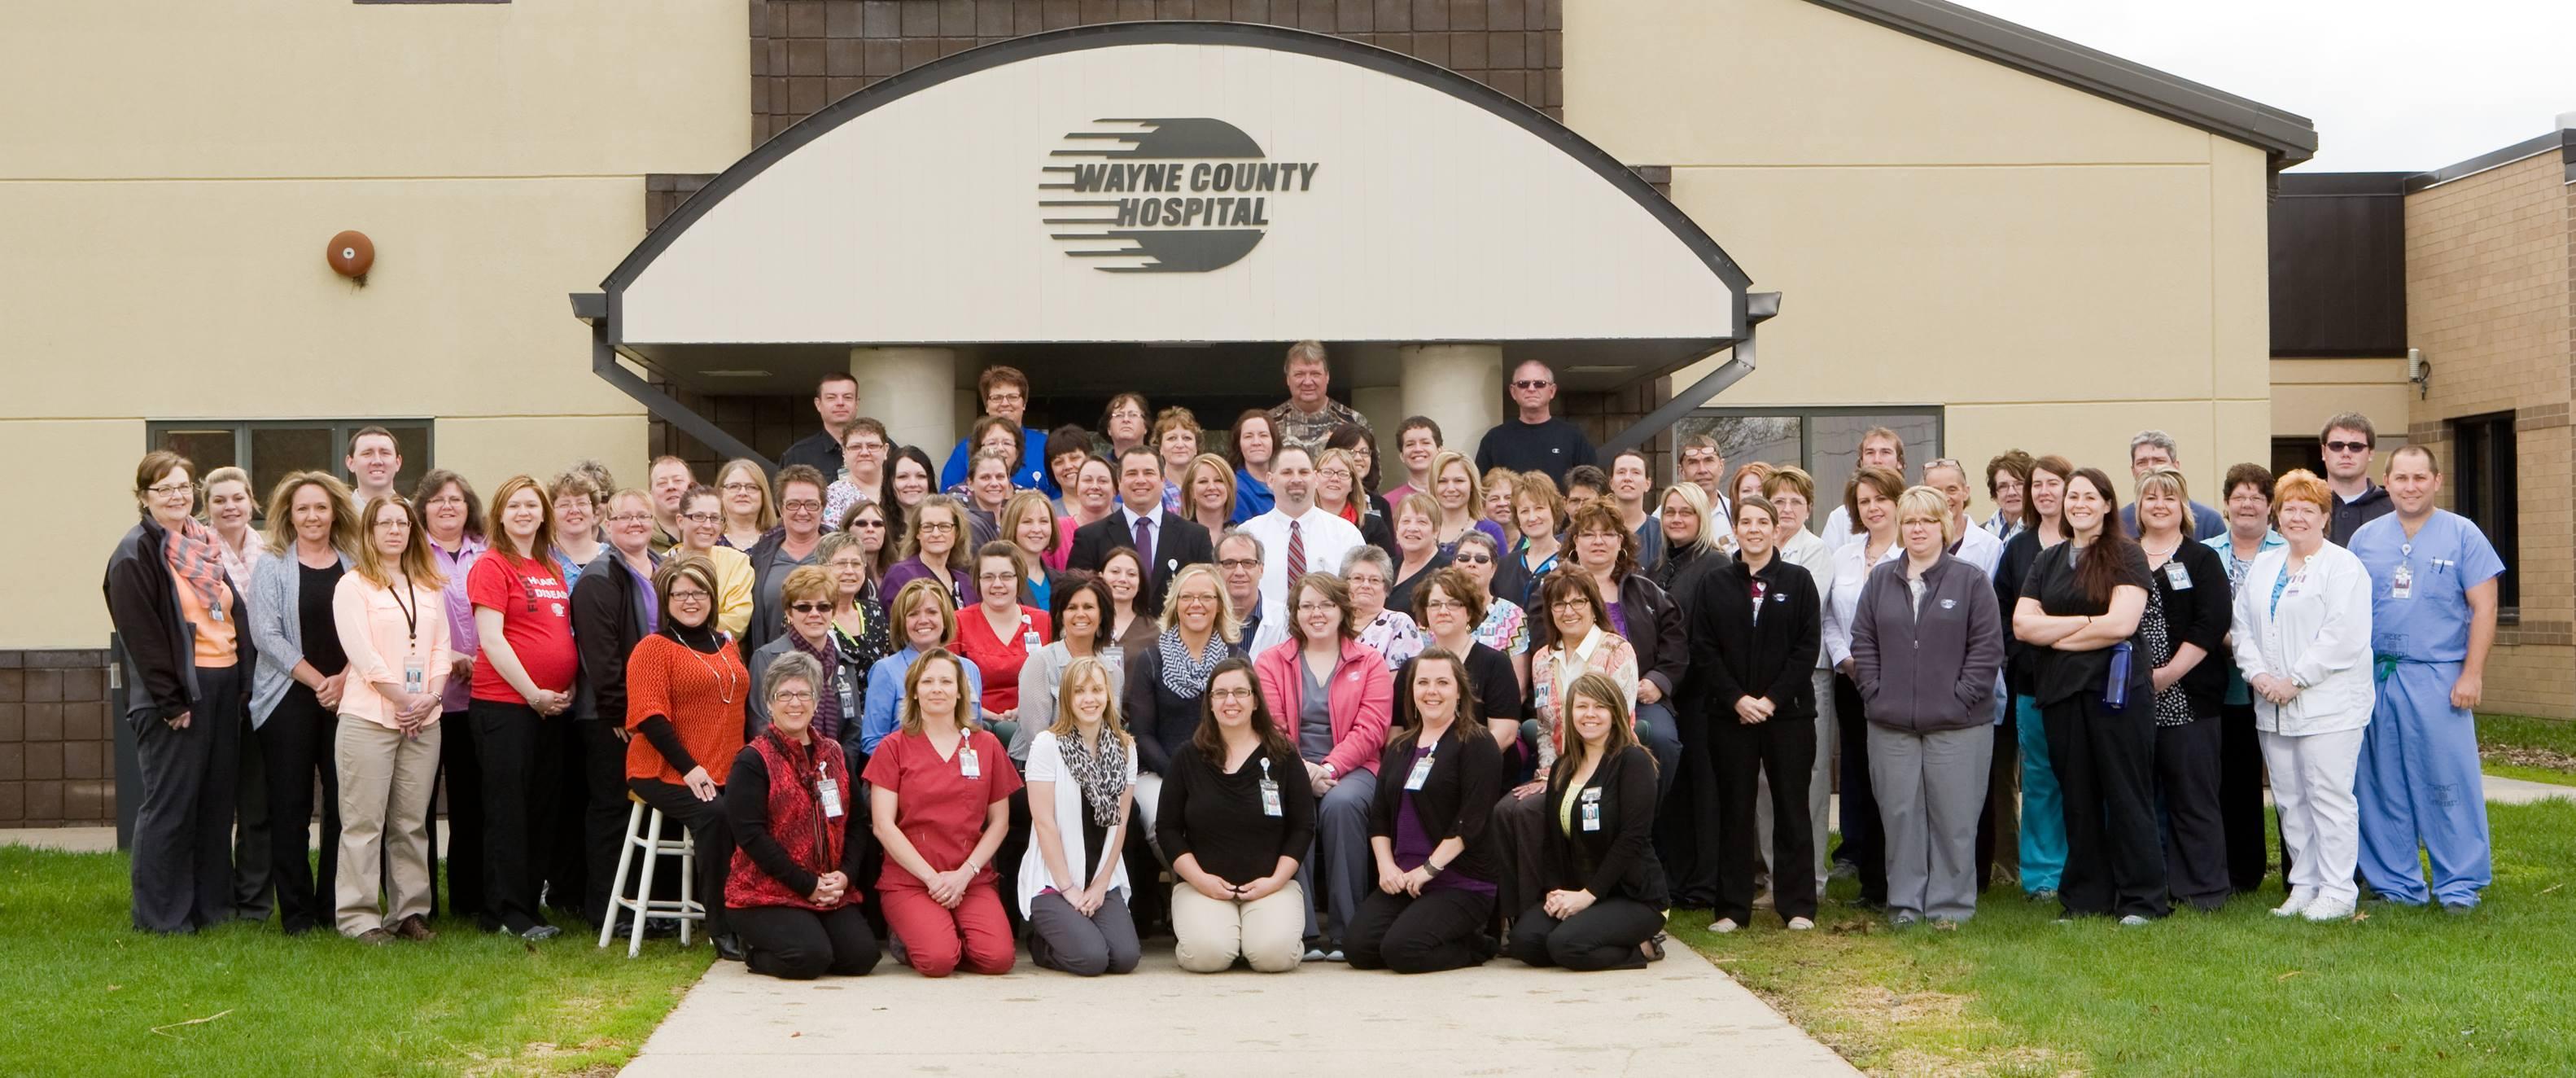 Wayne County Hospital & Clinic System